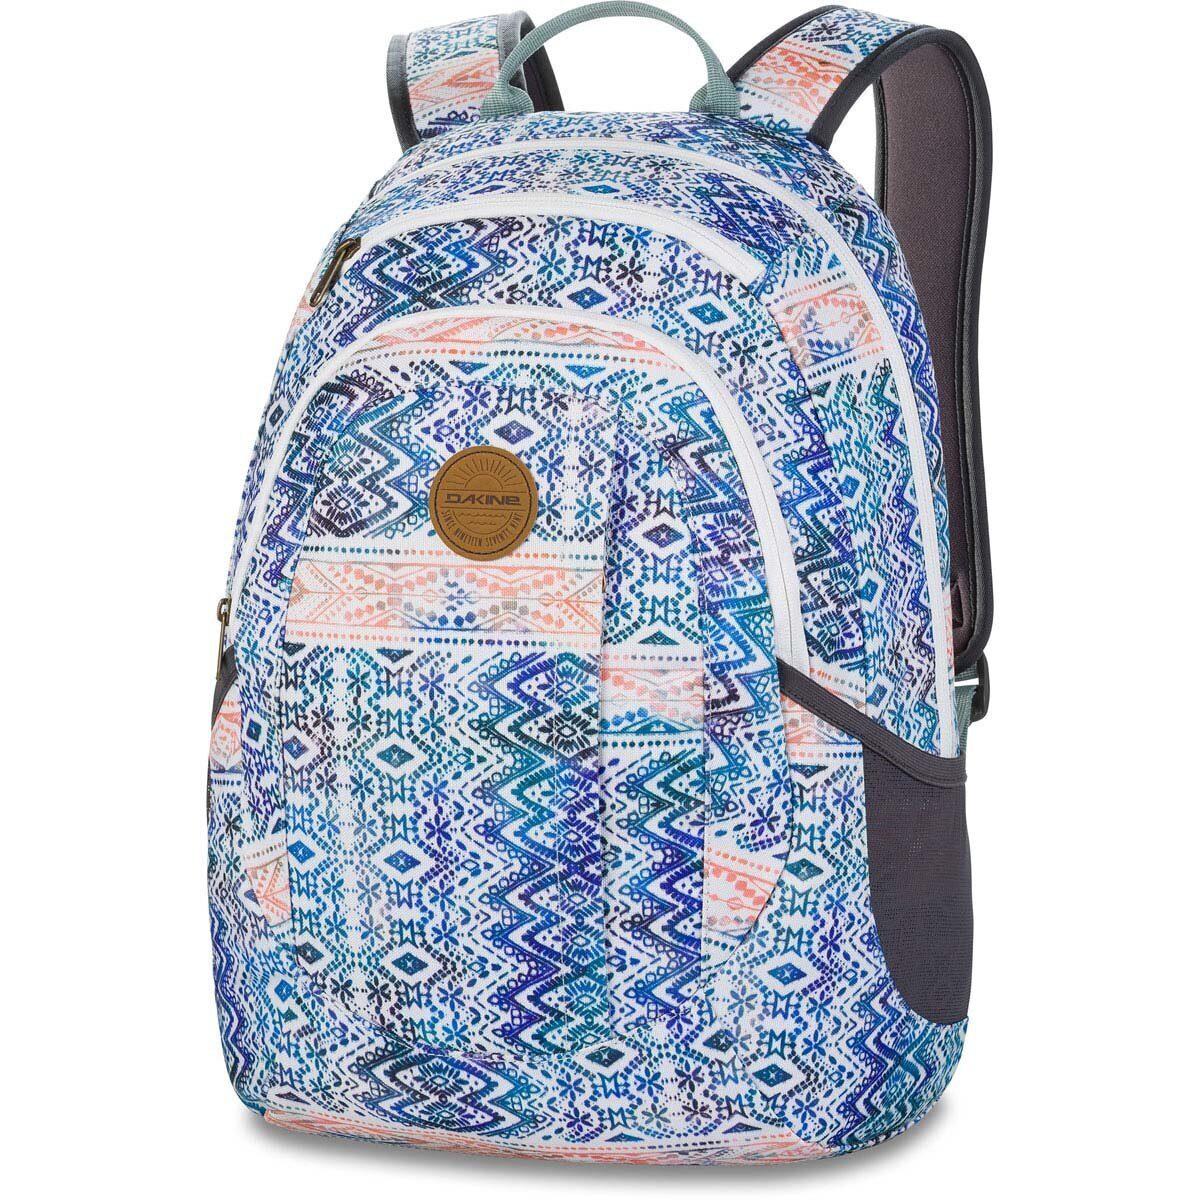 d0b21e5bcc40 Женский рюкзак Dakine Garden Pack 20L Sunglow